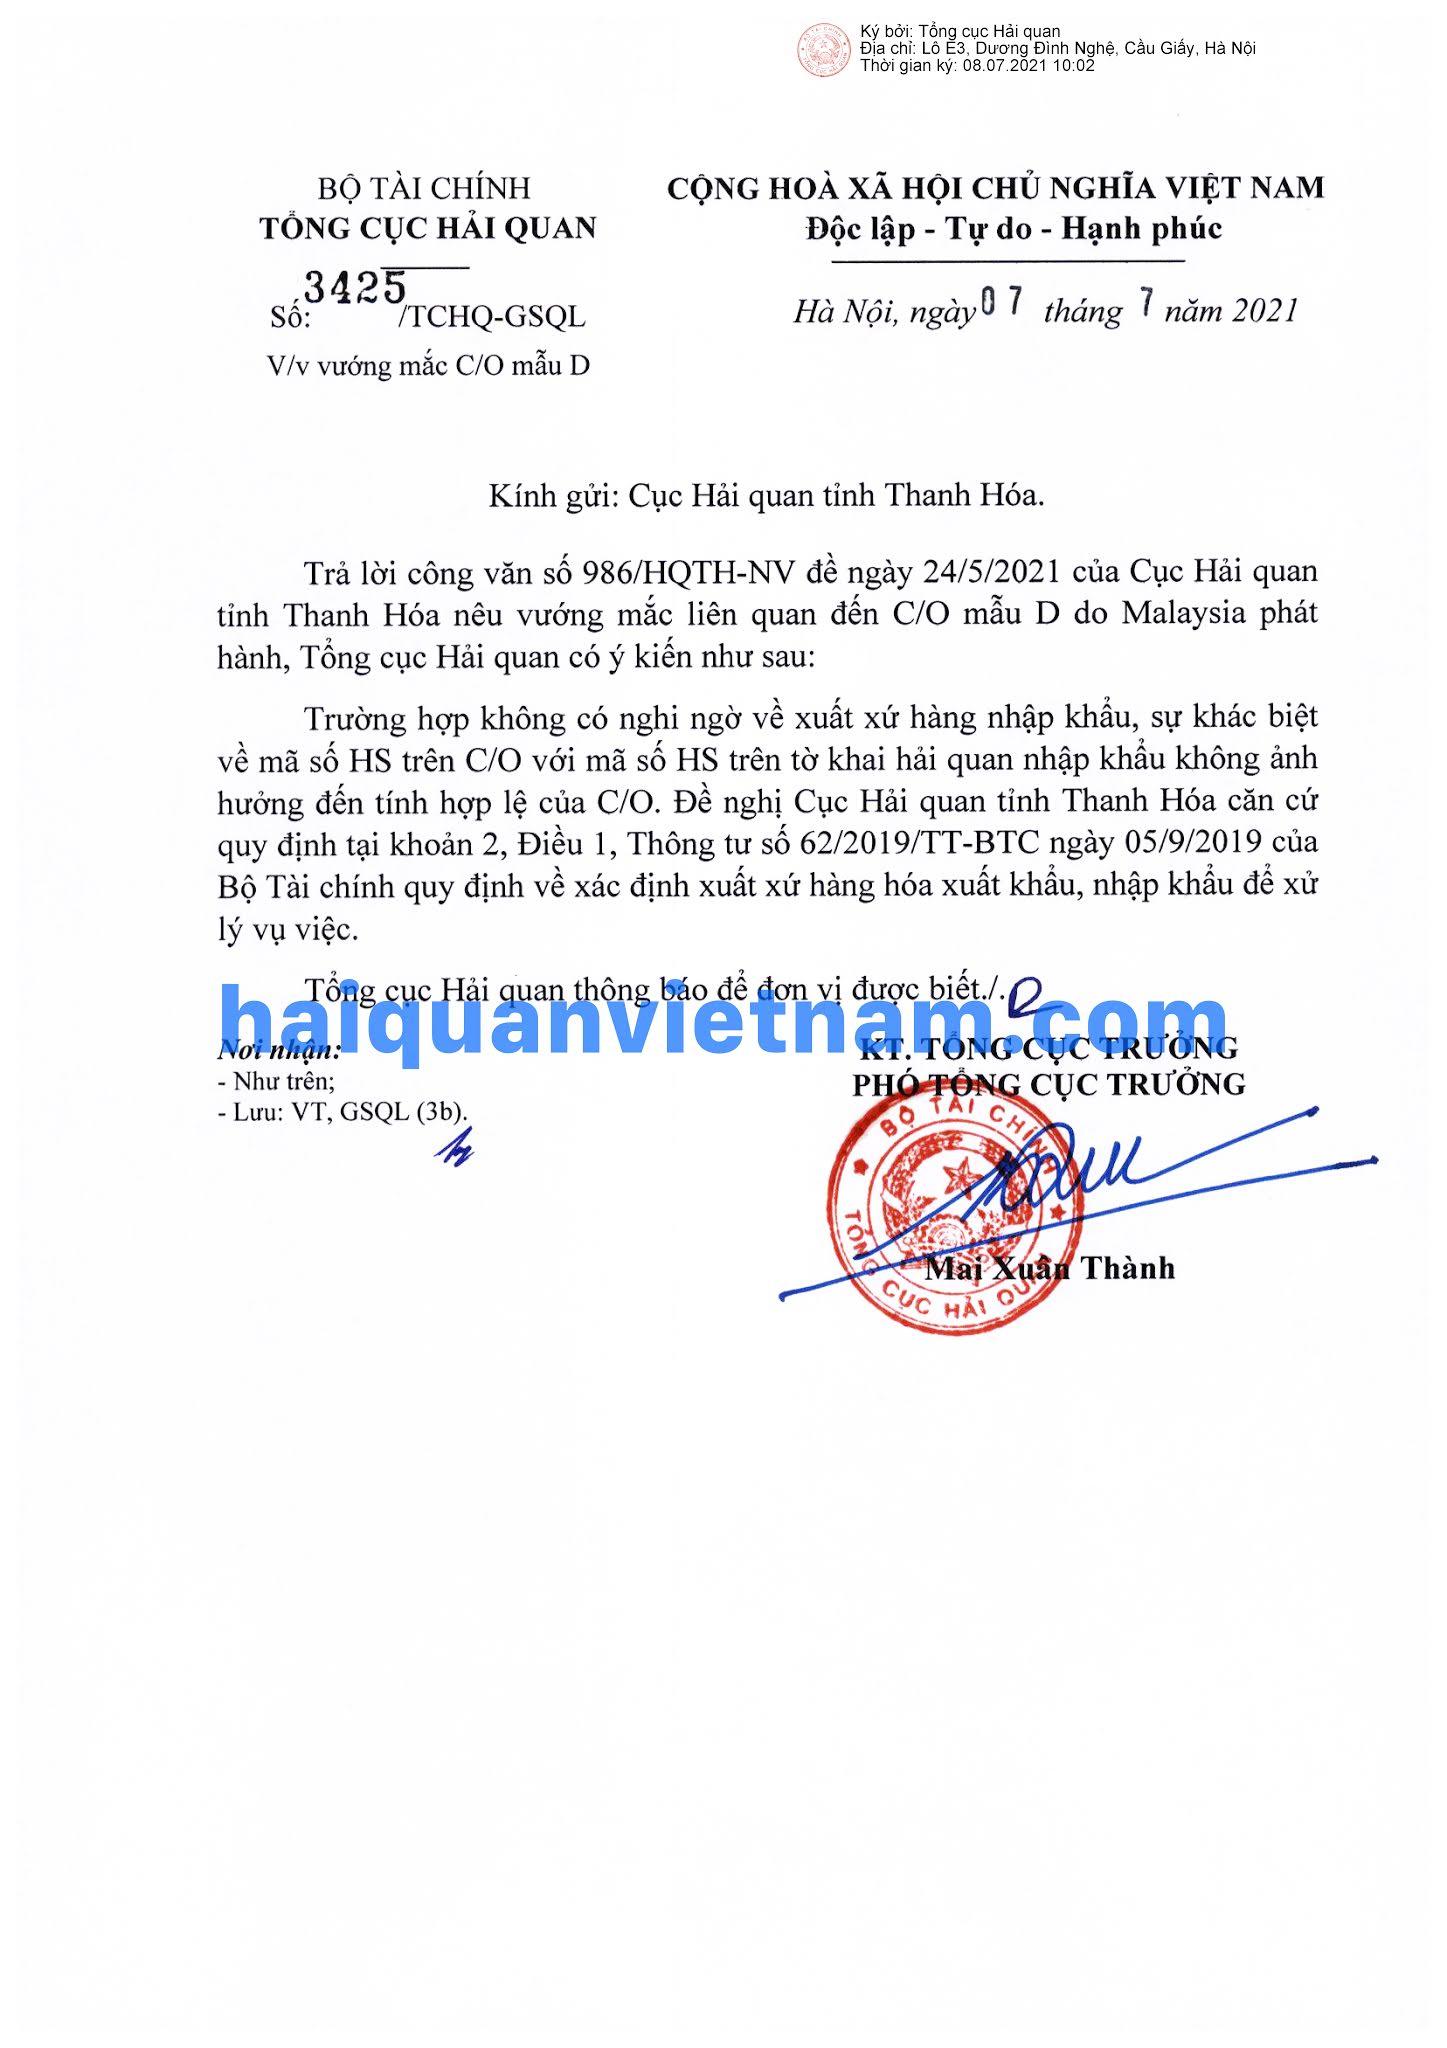 [Image: 210707-3425-TCHQ-GSQL_haiquanvietnam_01.jpg]